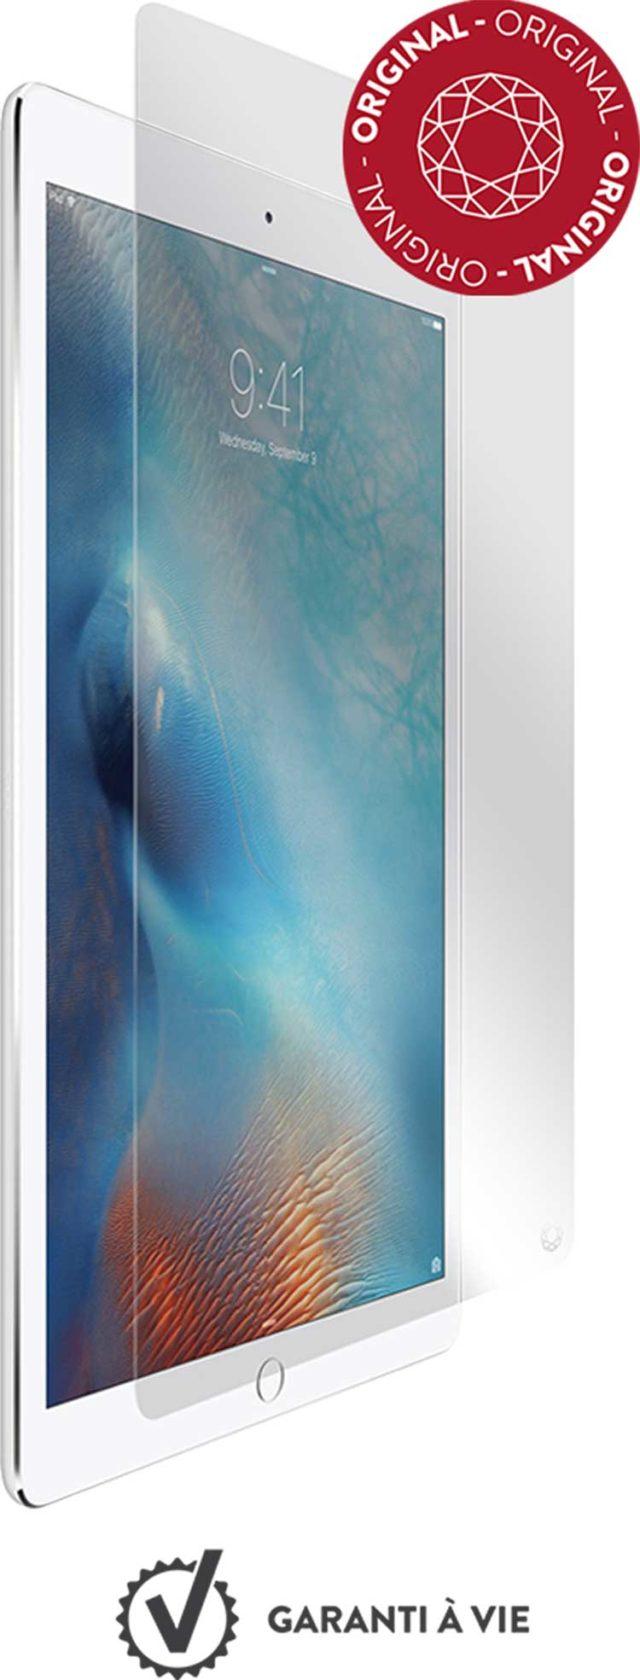 The tempered glass screen protector FORCE GLASS for iPad Pro 12.9 - Imagen del envoltorio